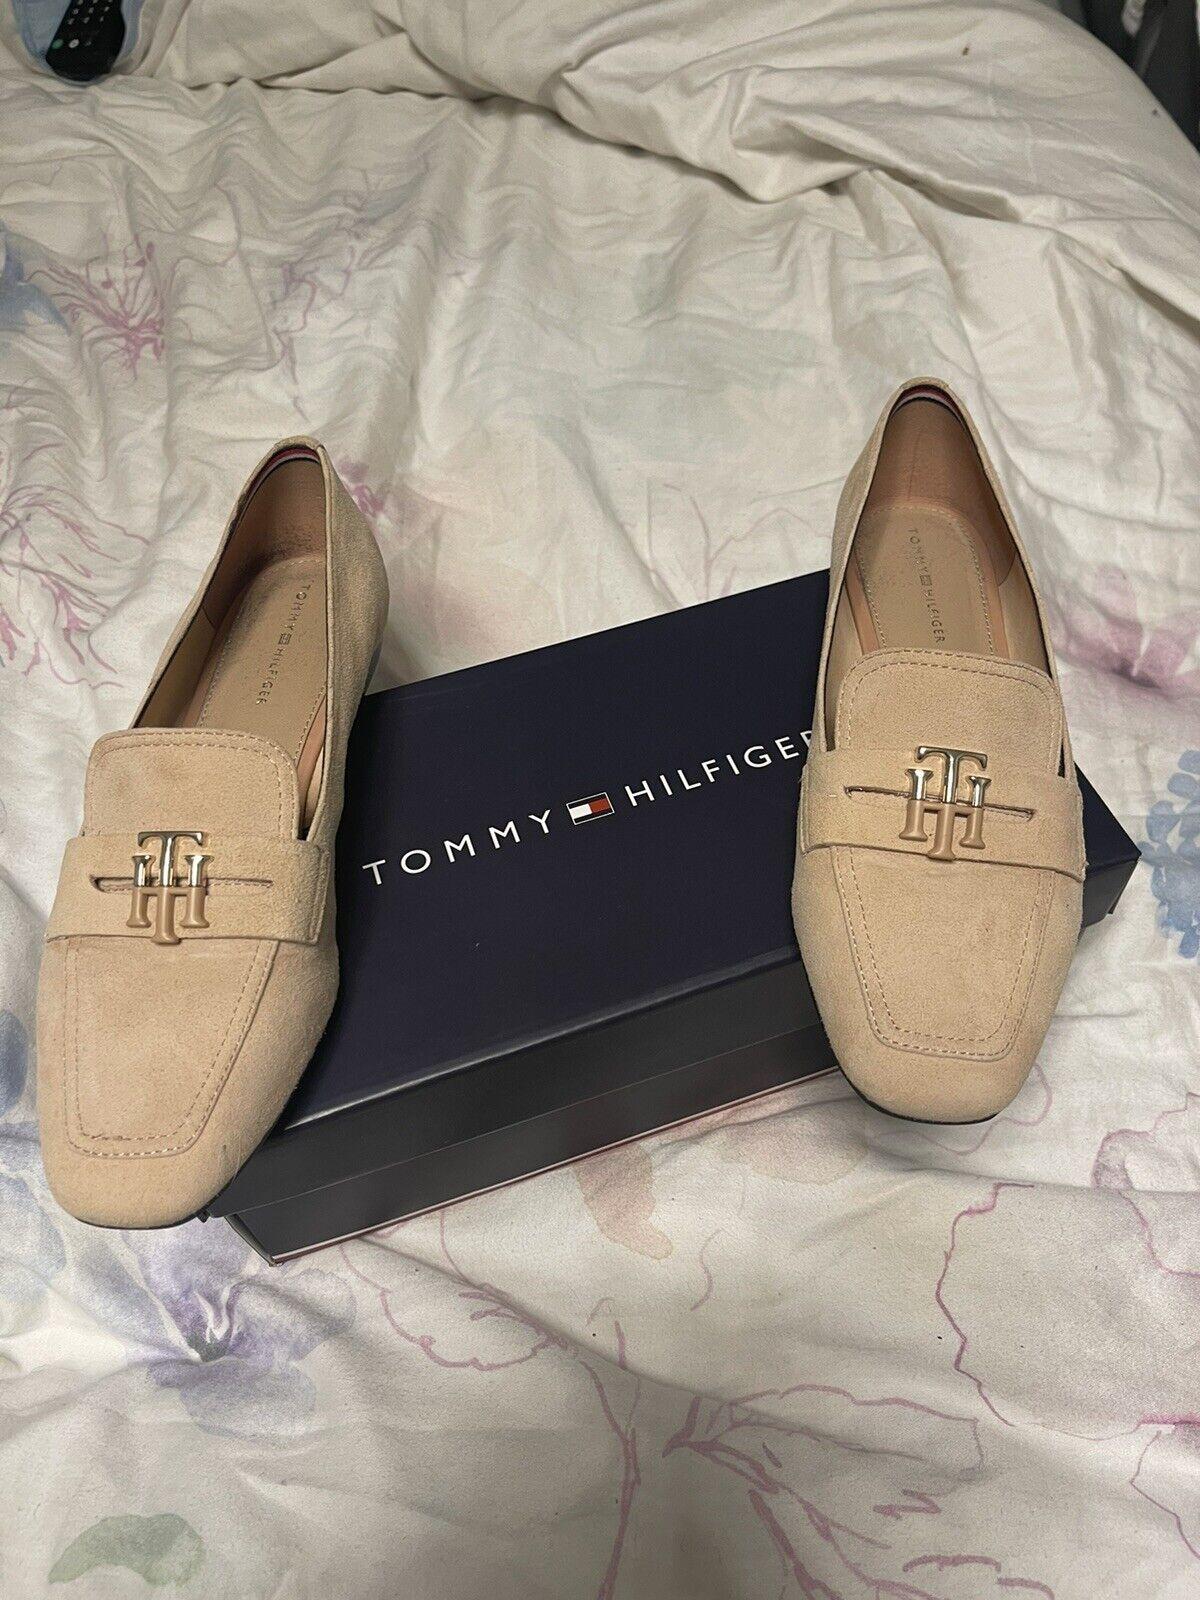 Tommy Hilfiger Shoes Size 4